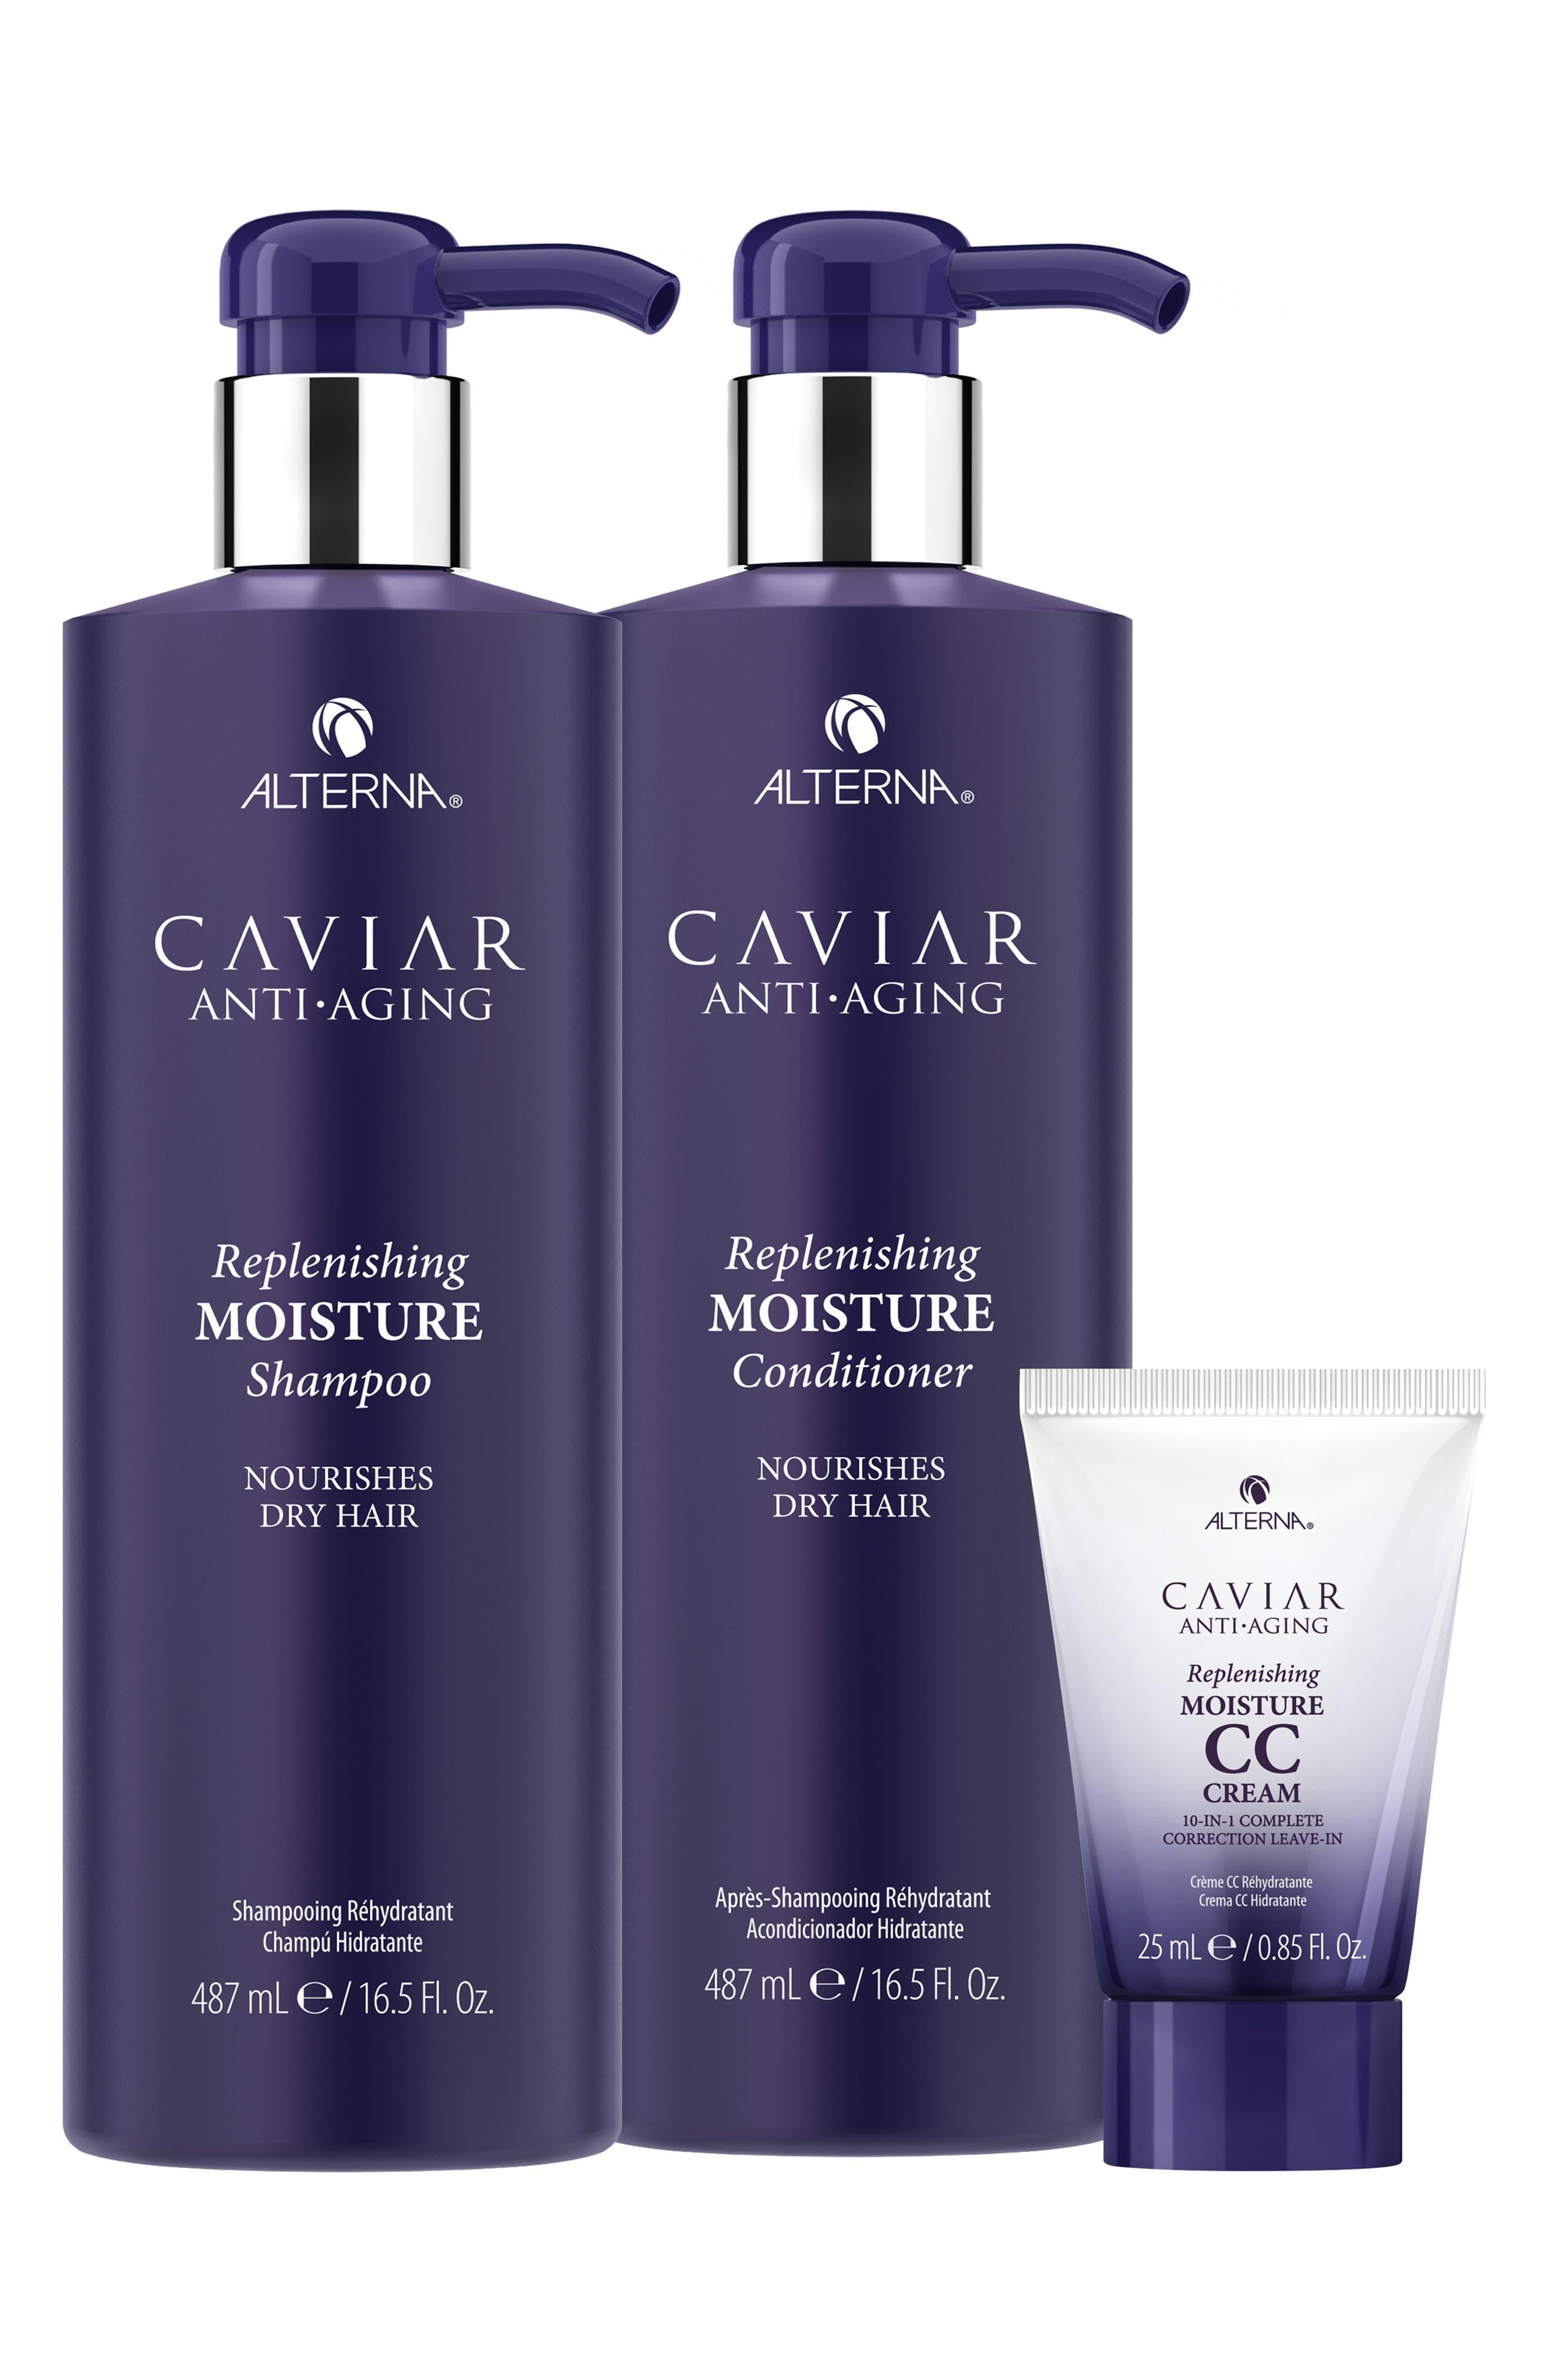 Alterna Caviar Anti-Aging Set-$114 Value